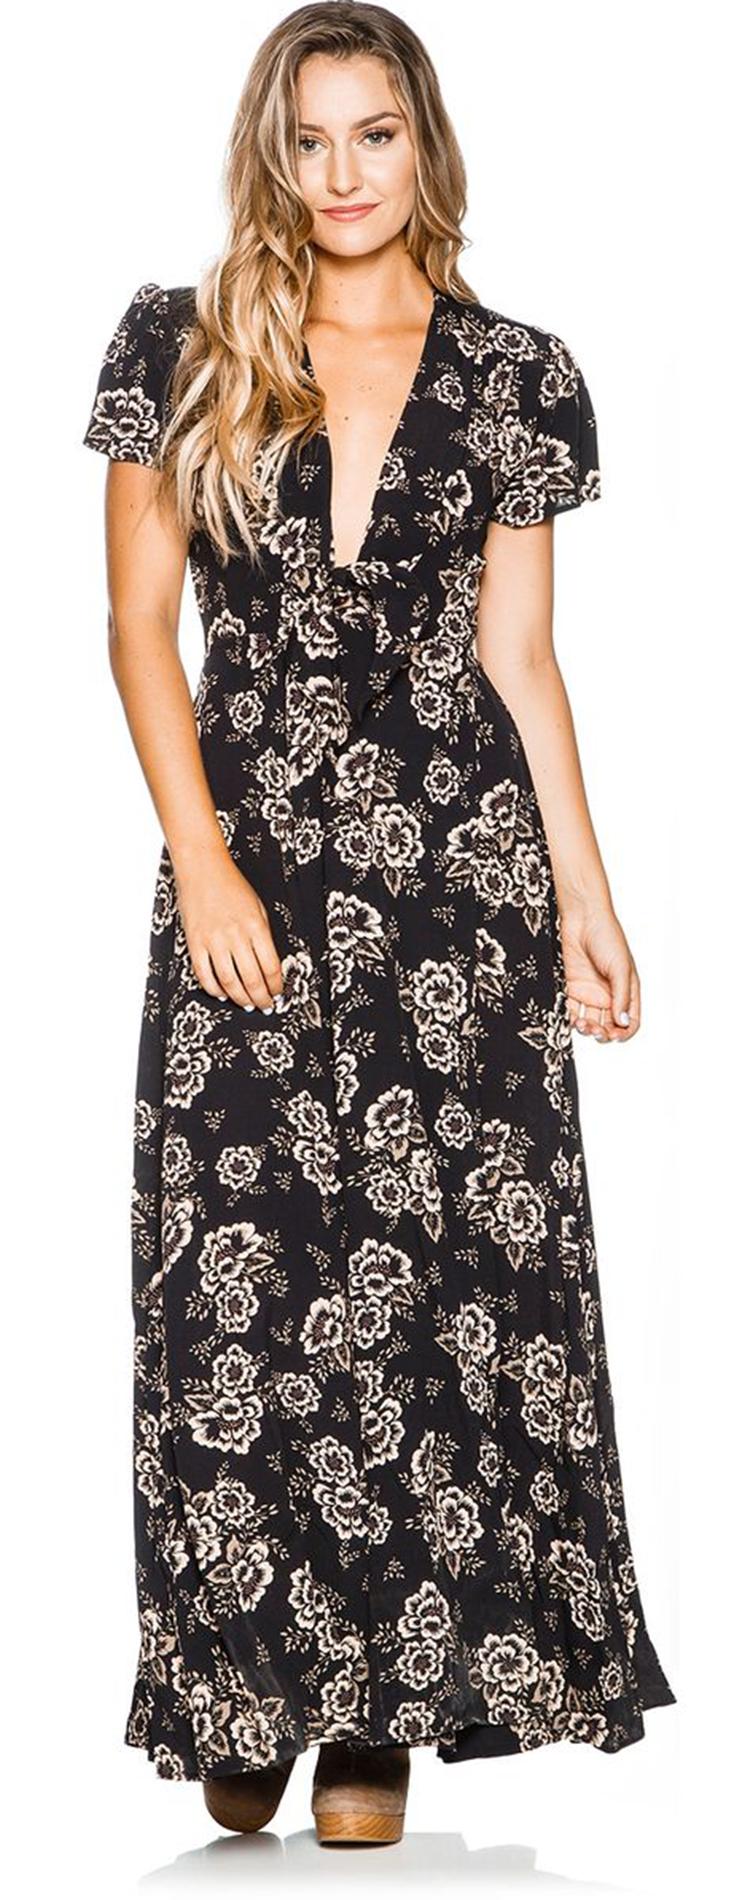 THE HIDDEN WAY KAHALE CAMELLIA PRINT MAXI DRESS